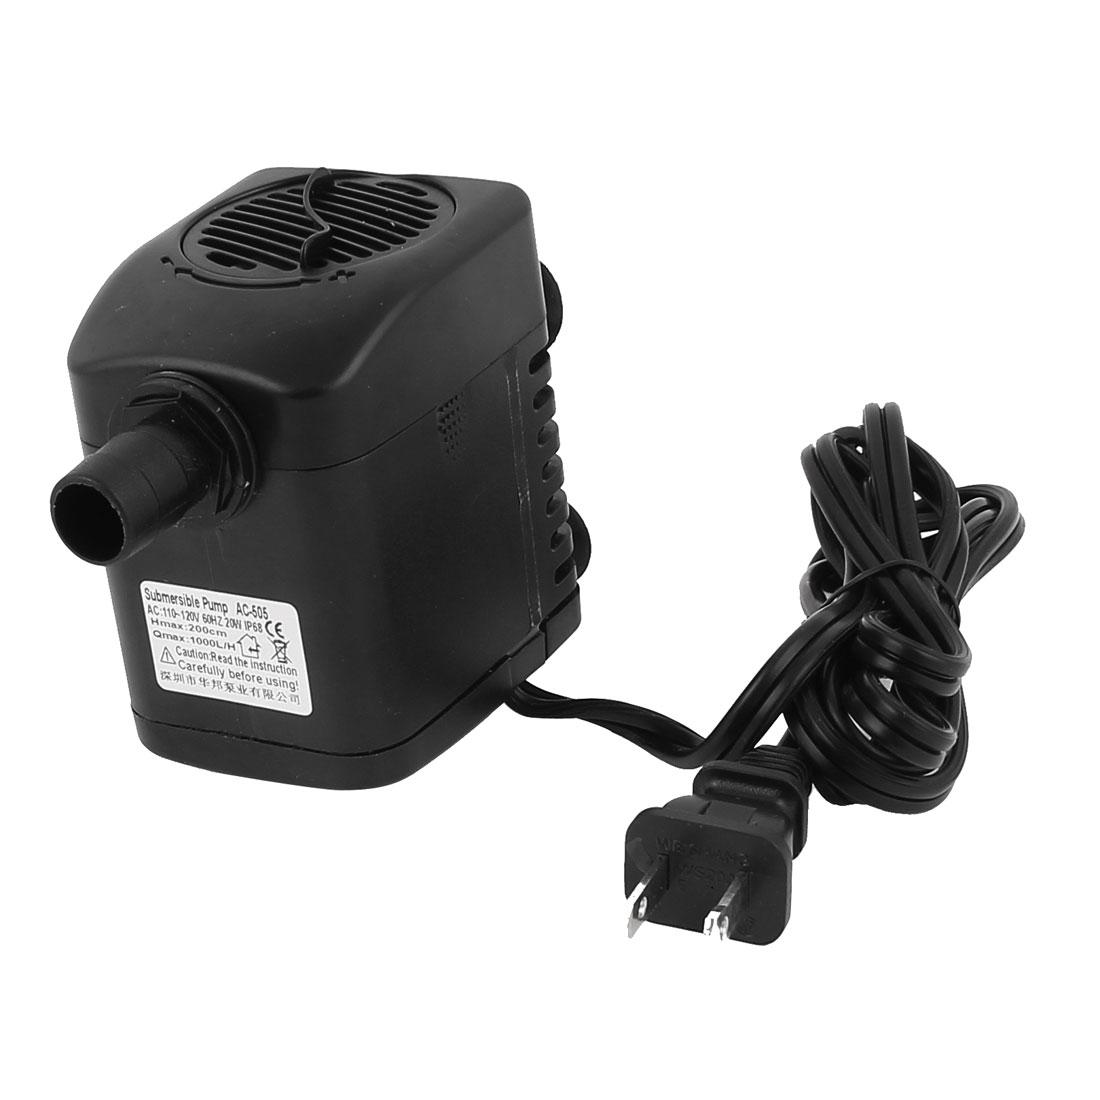 AC 110V US Plug 20W Electric Submersible Water Pump Aquarium Fountain